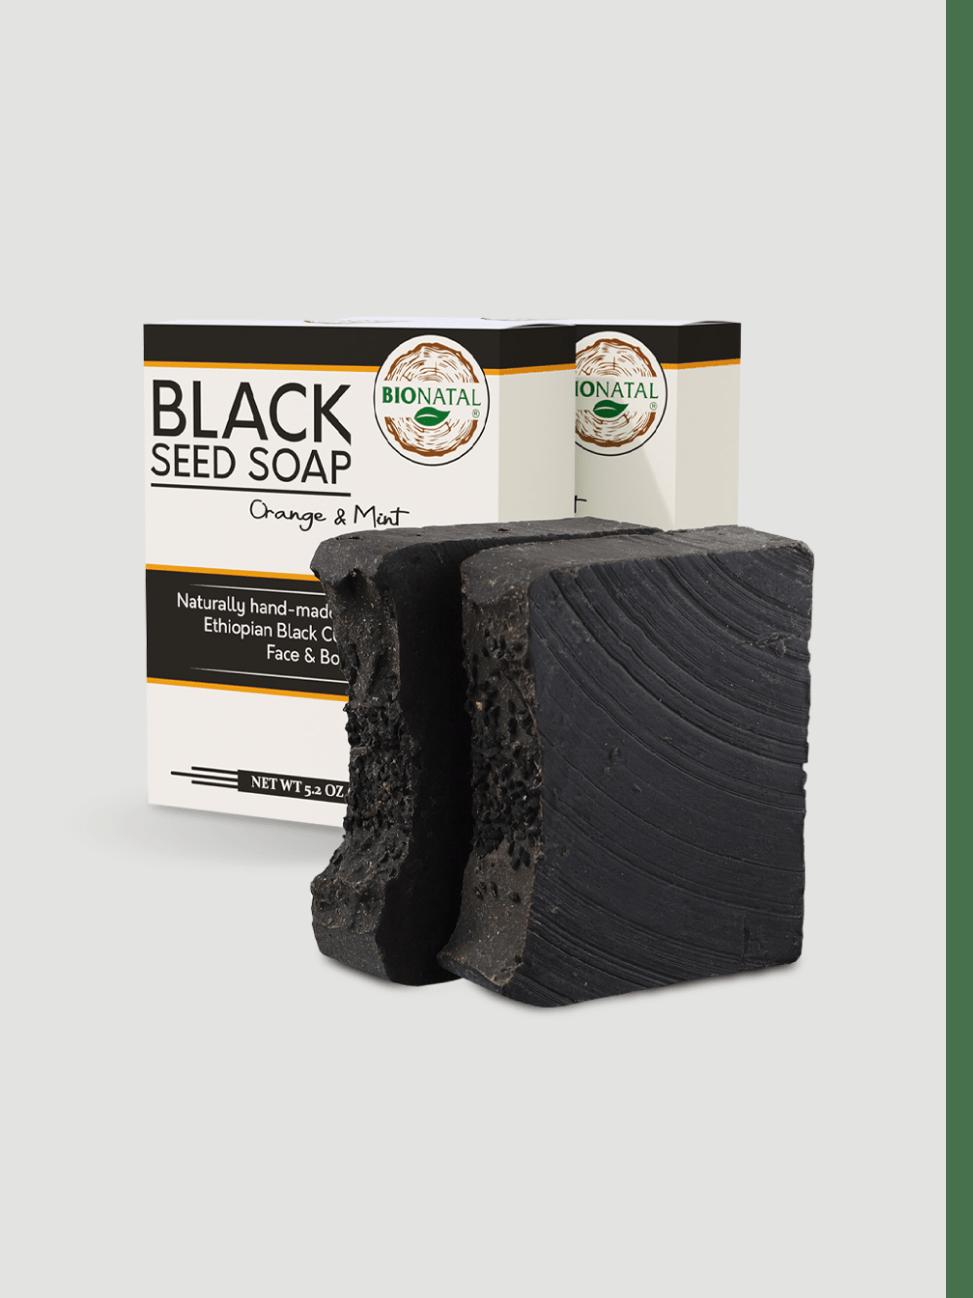 2 Black Seed Soaps (Ethiopian Seeds) Orange & Mint